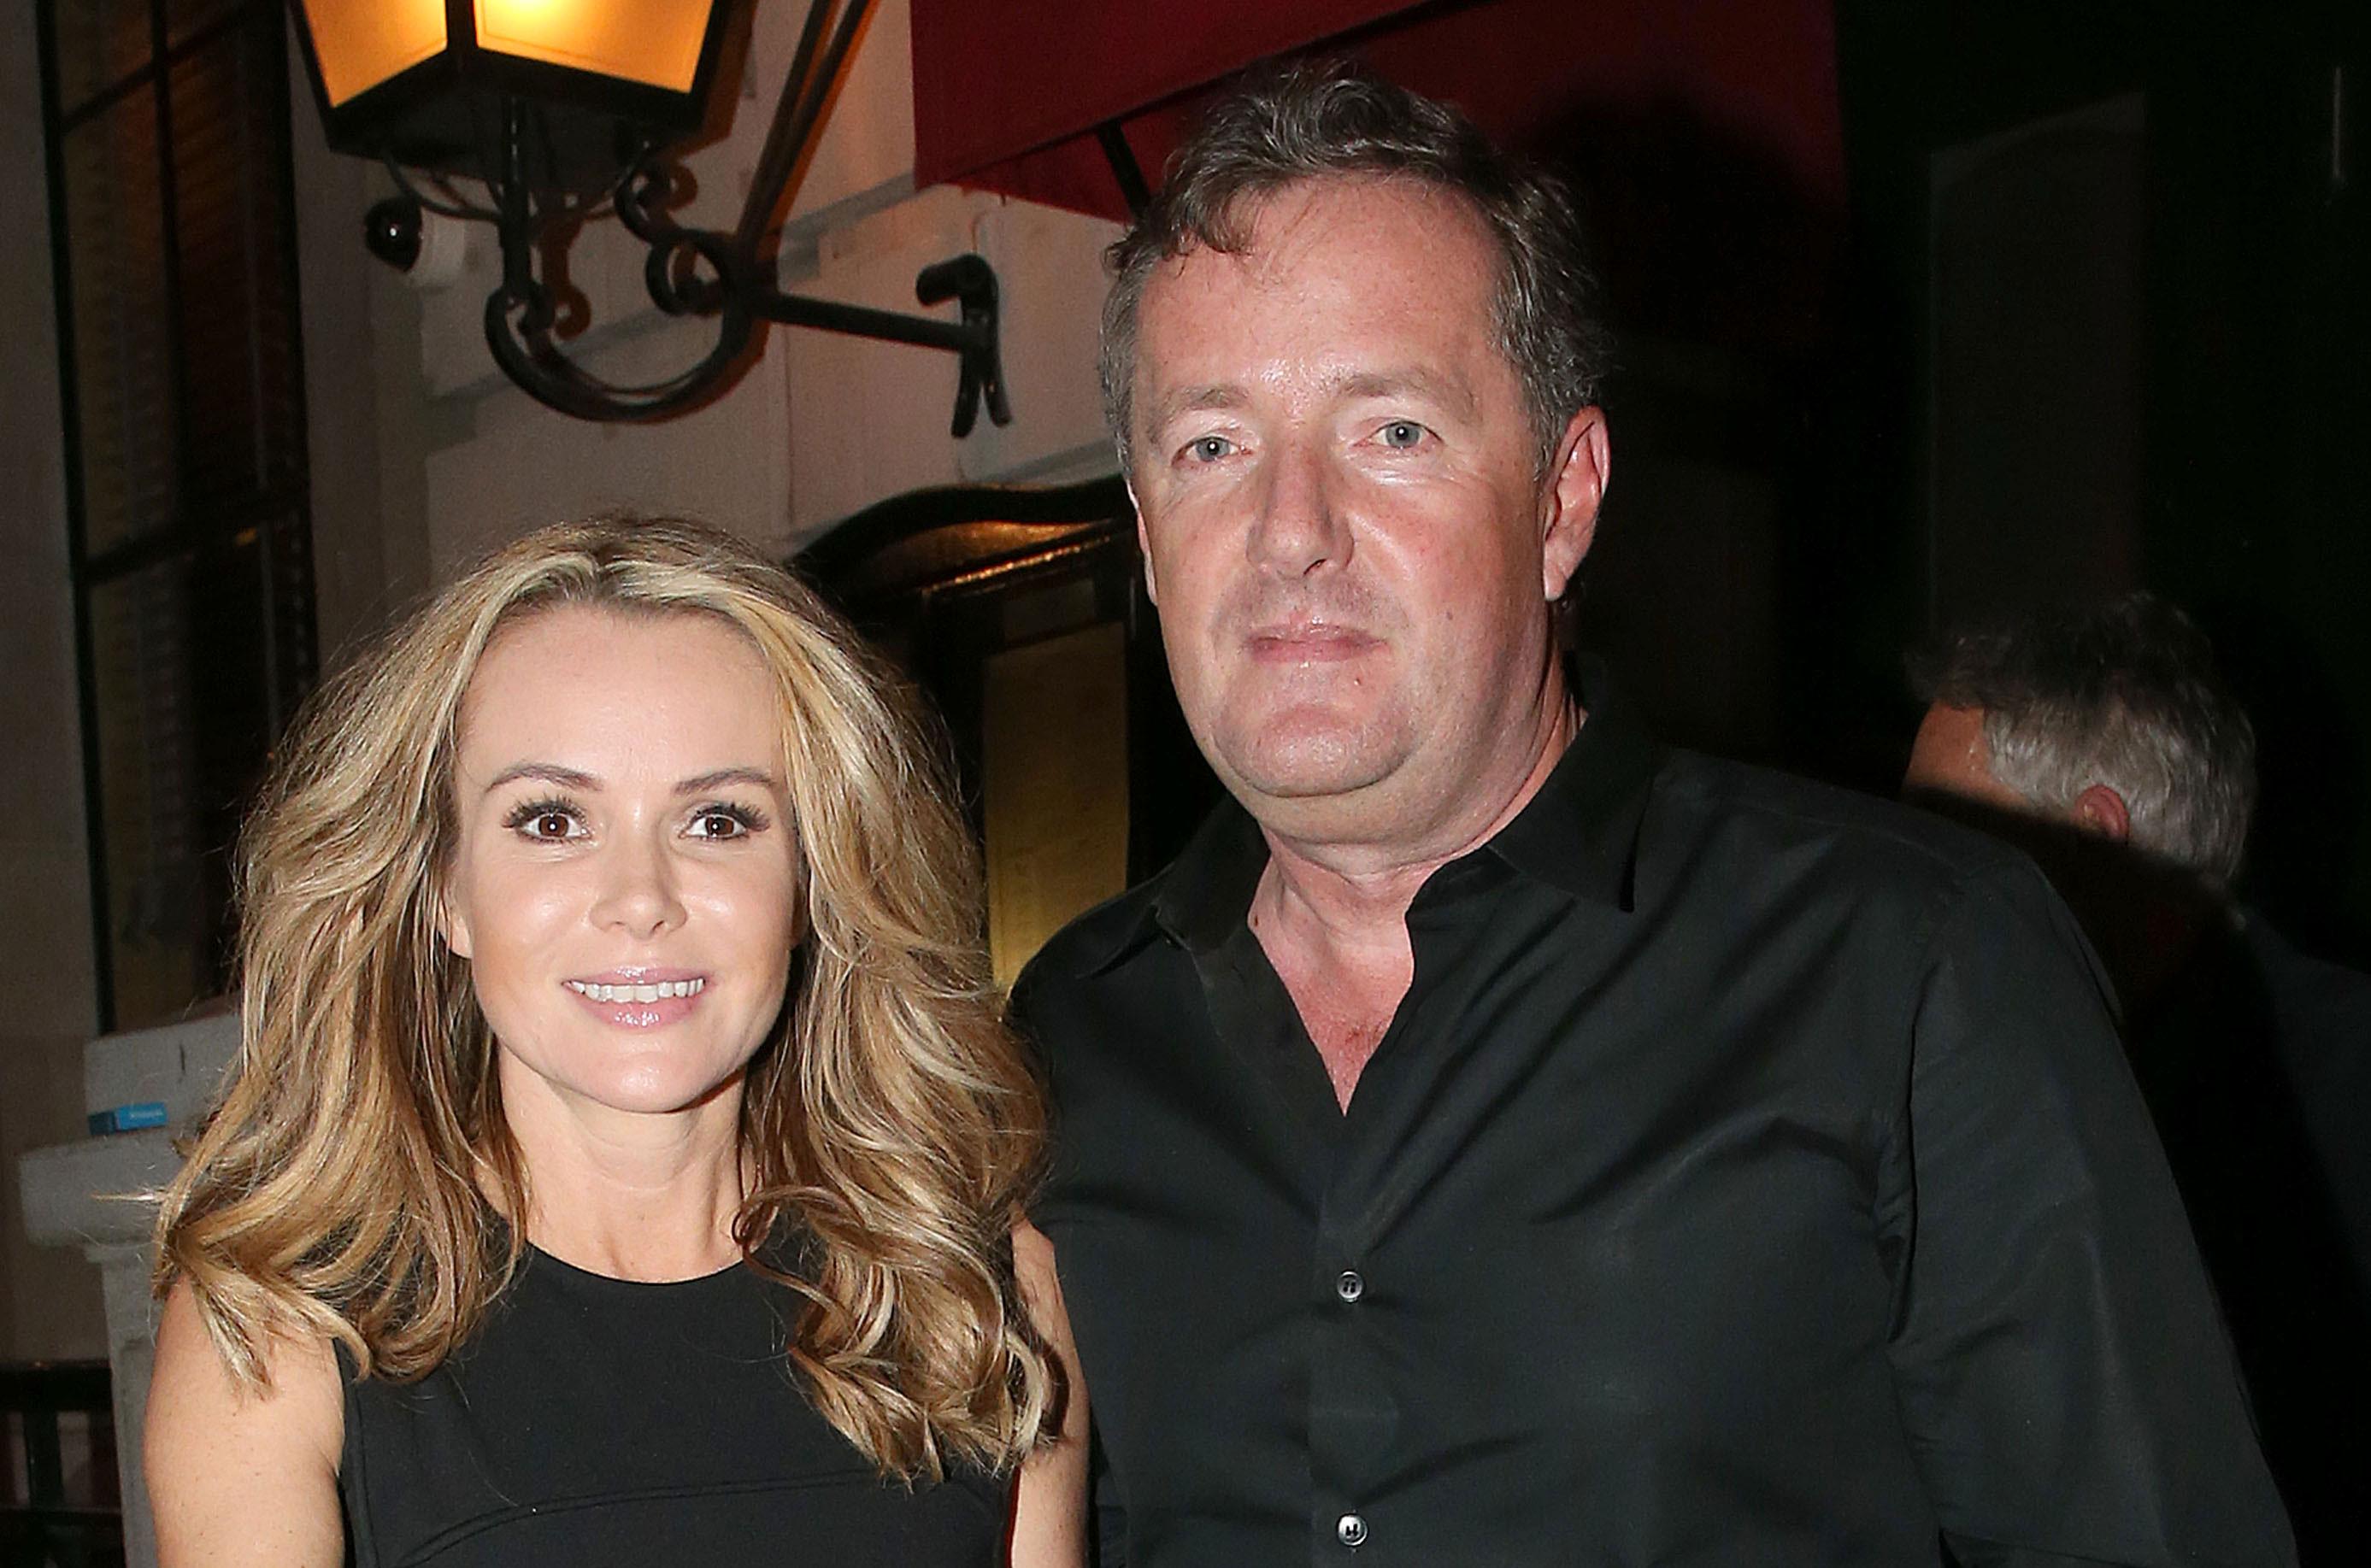 Grinning Piers Morgan mocks injured Amanda Holden during night out